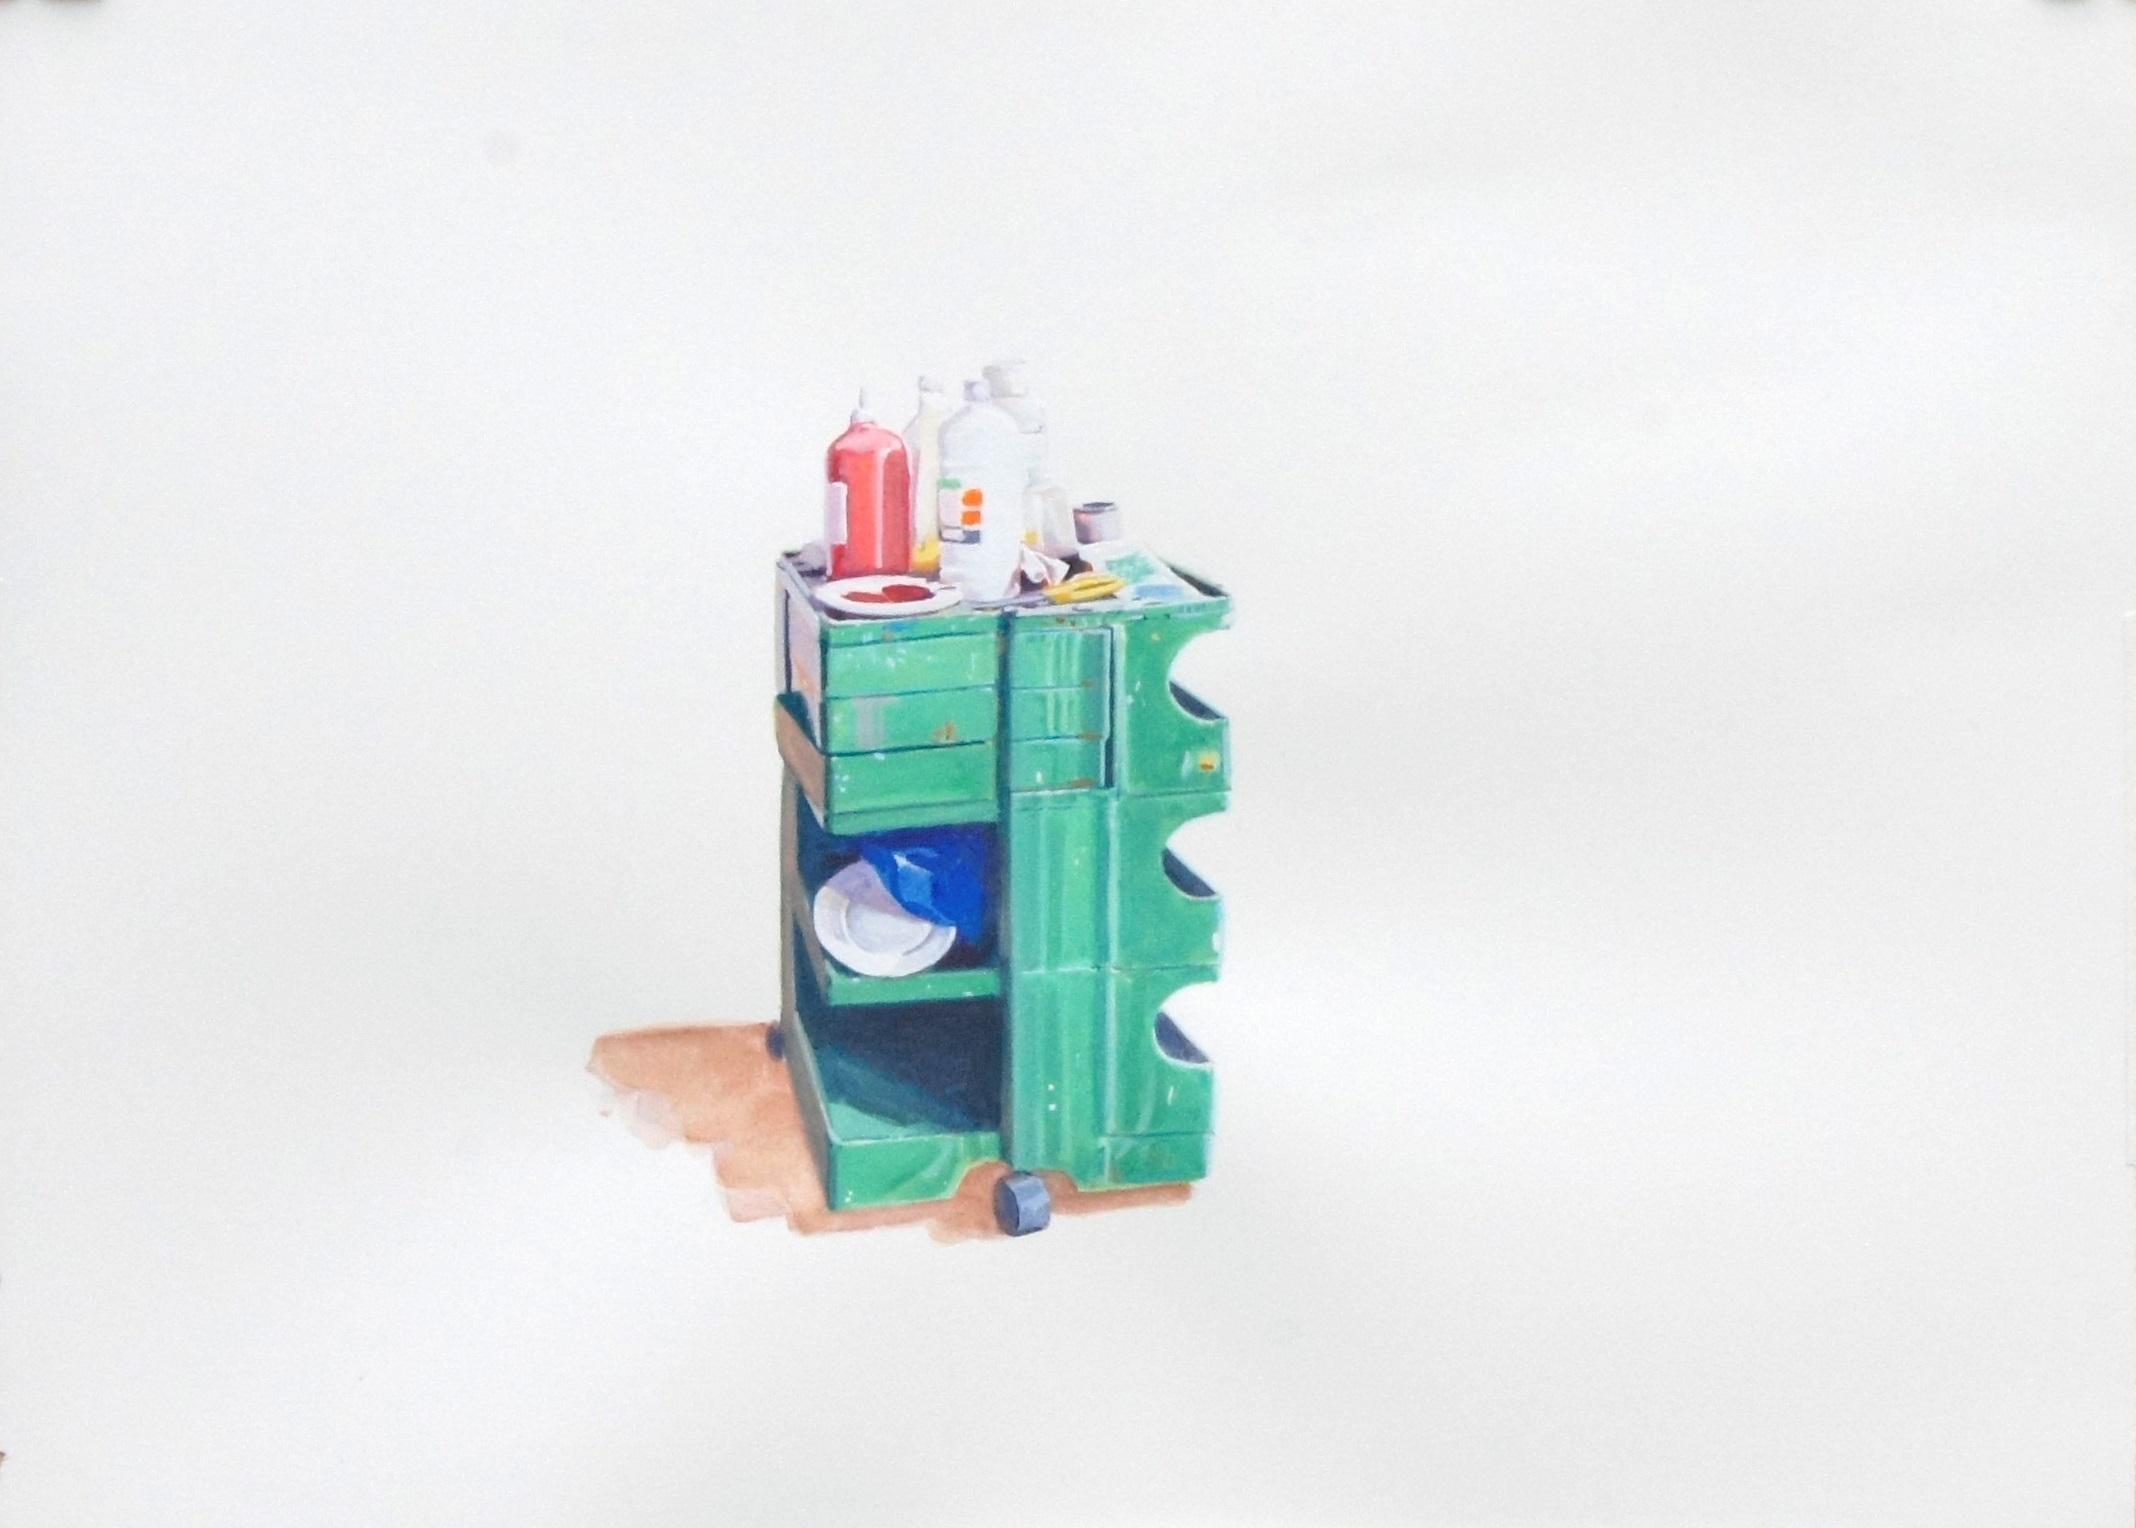 TM321. Patricia Mateo. Carrito. 2019. Gouache sobre papel. 28,50 x 38,50 cm